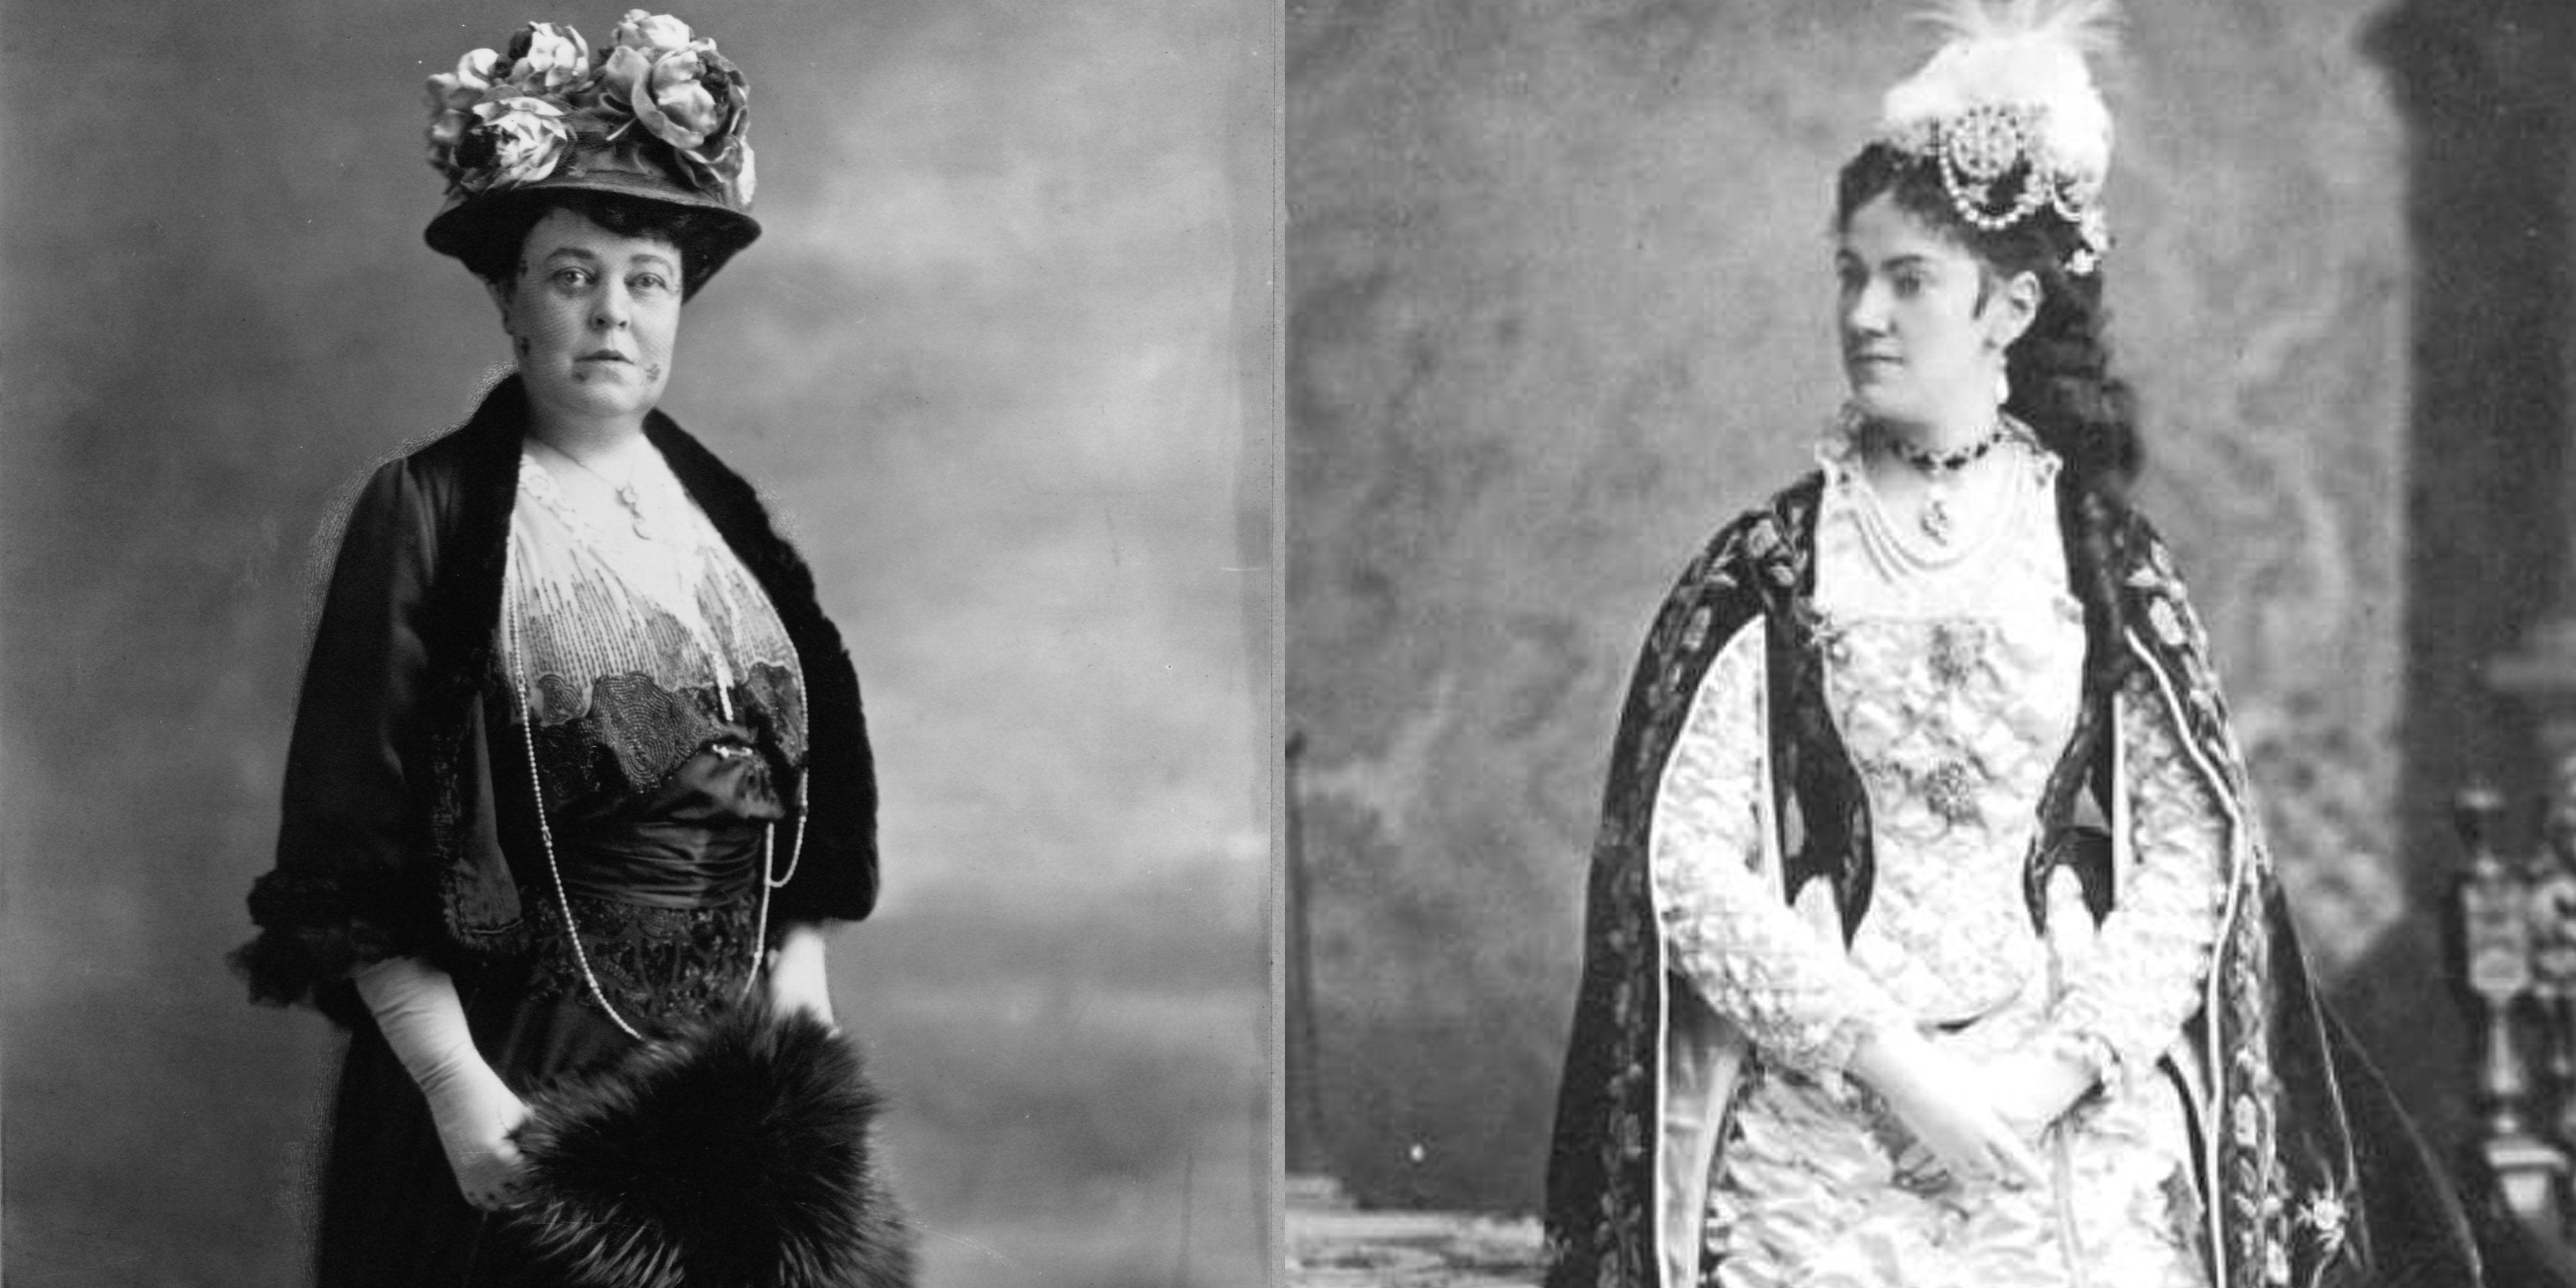 Alva Vanderbilt and Caroline Astor